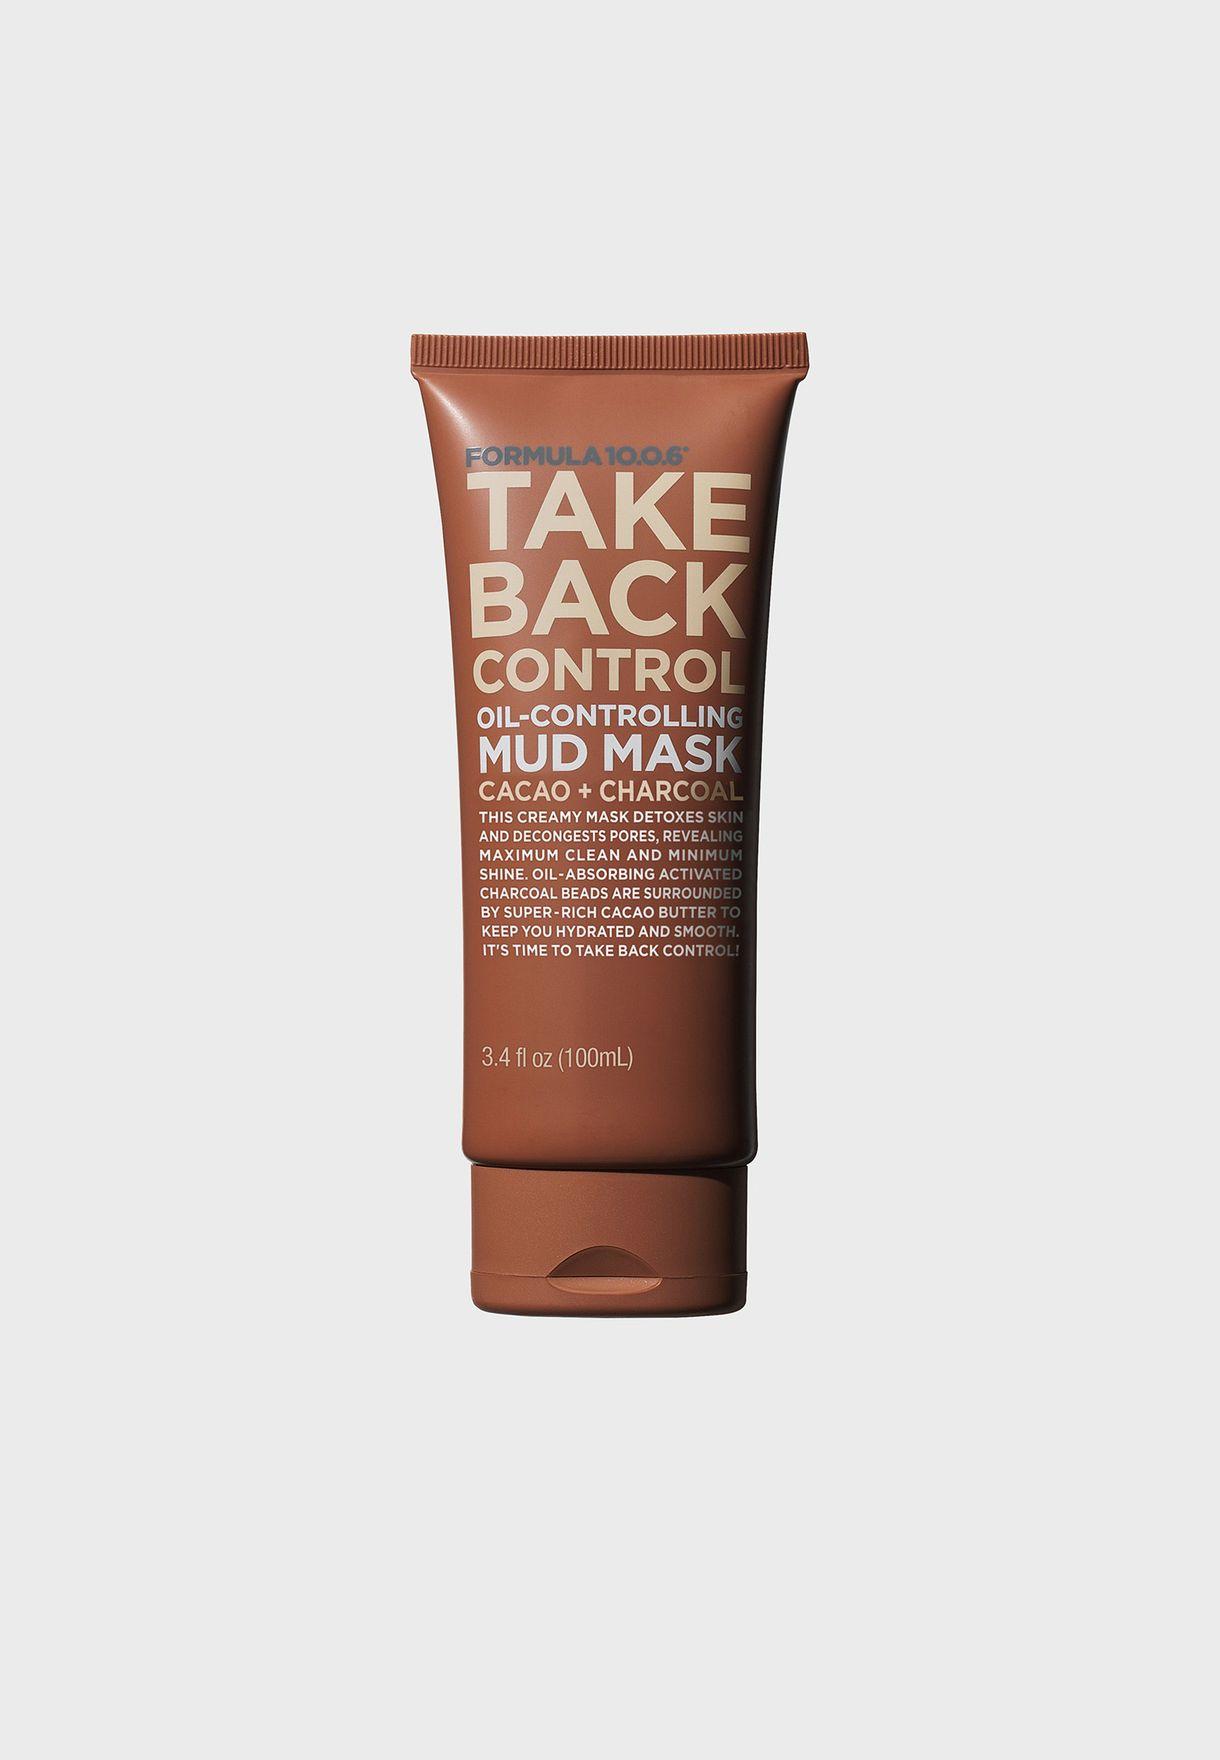 Take Back Control - Oil Controlling Mud Mask